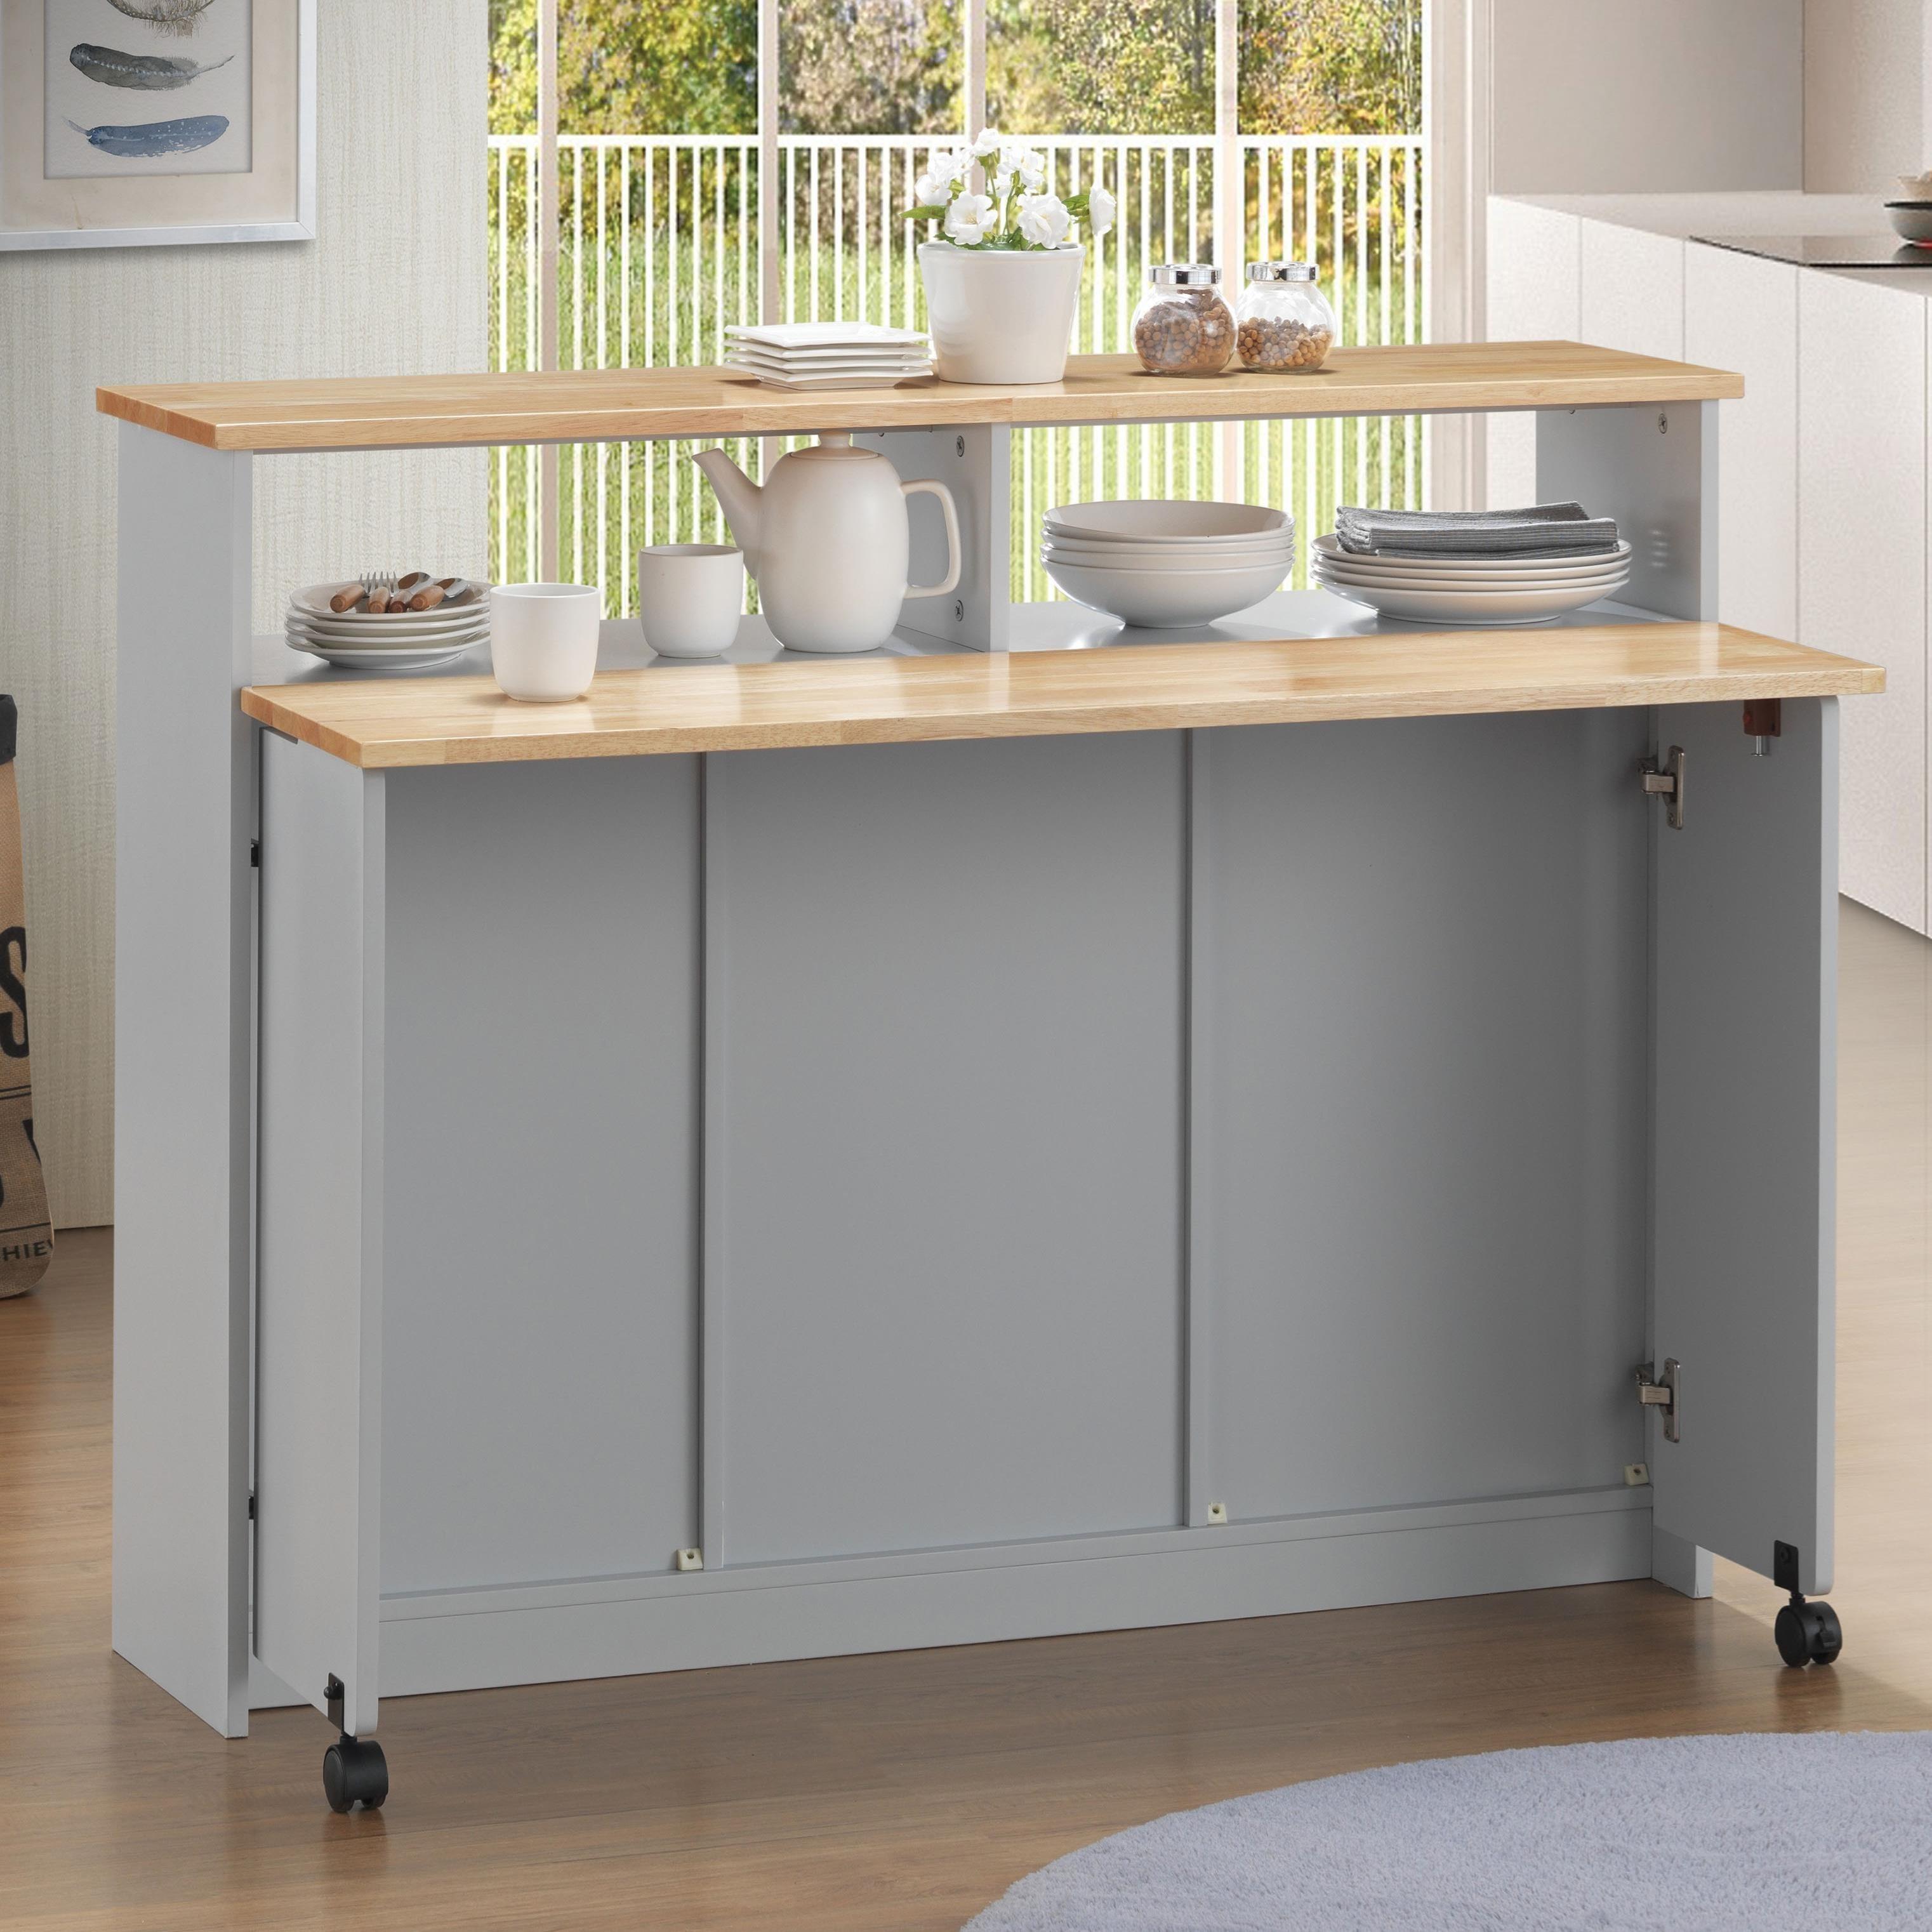 Acme Furniture Jorim 98398 Casual 11 Shelf Kitchen Island Cart With Drop Leaf And Casters Del Sol Furniture Kitchen Islands